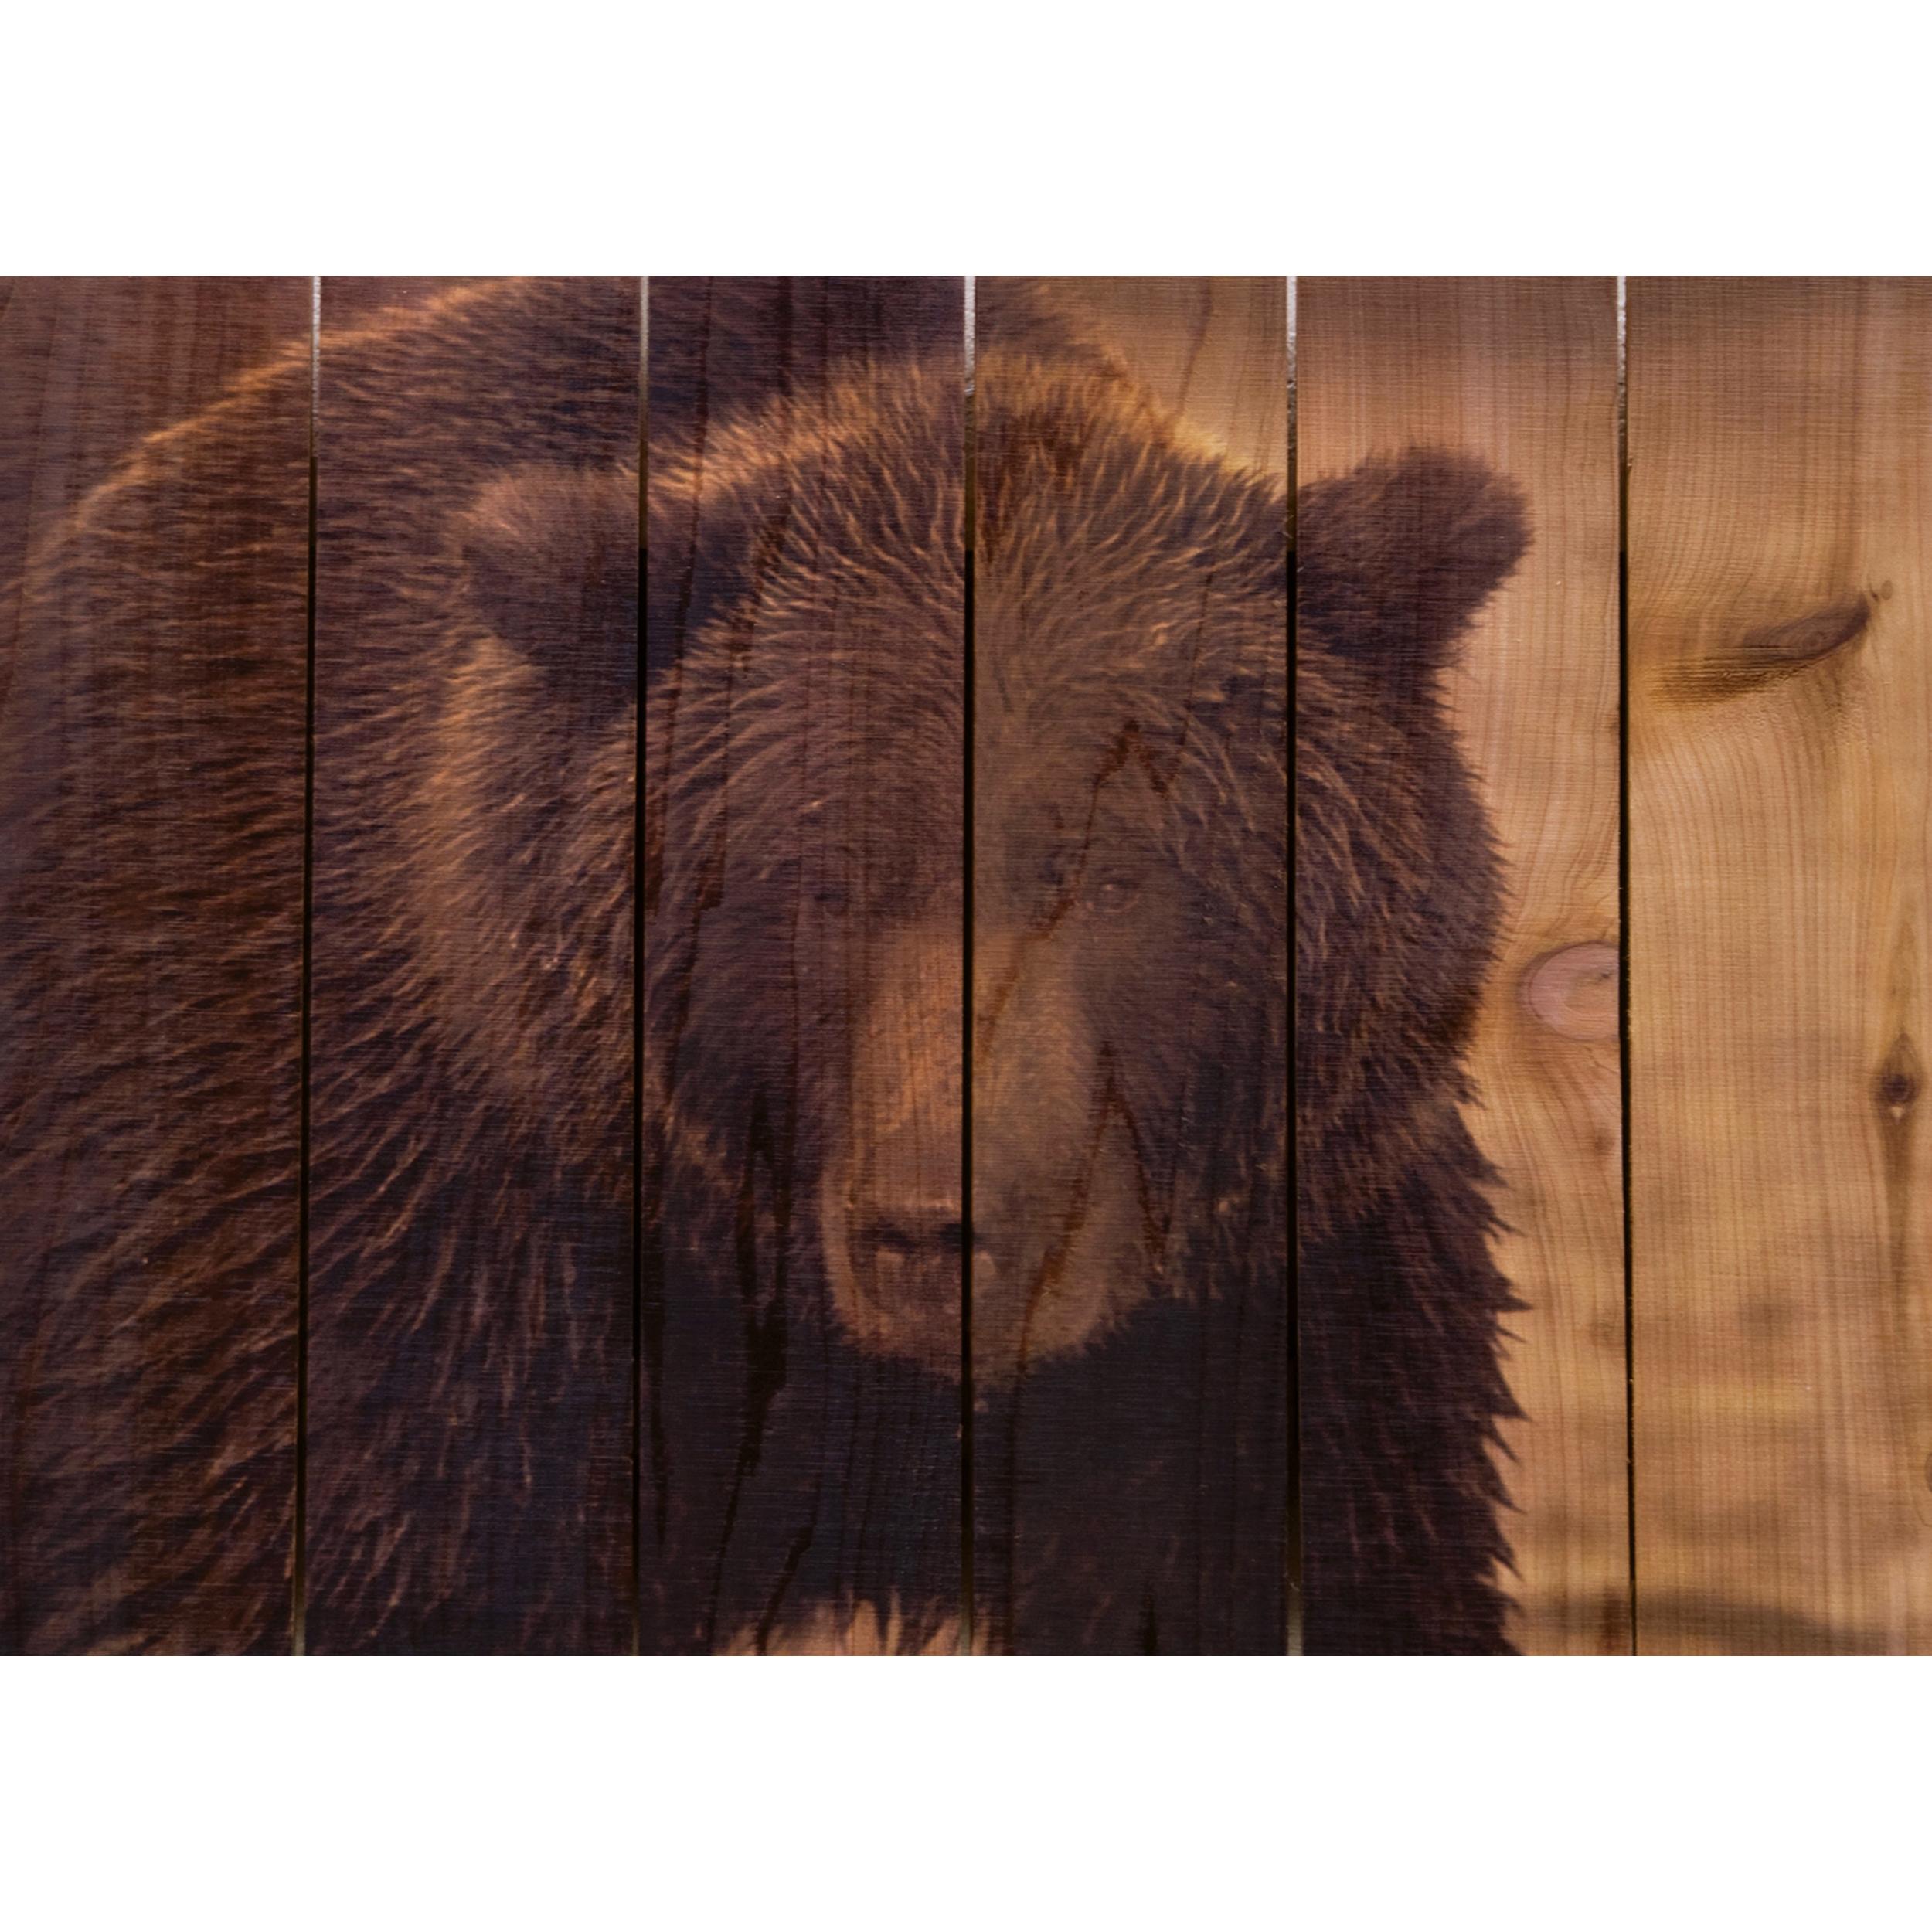 Daydream Gizaun Cedar Wall Art, Big Bear, 22.5